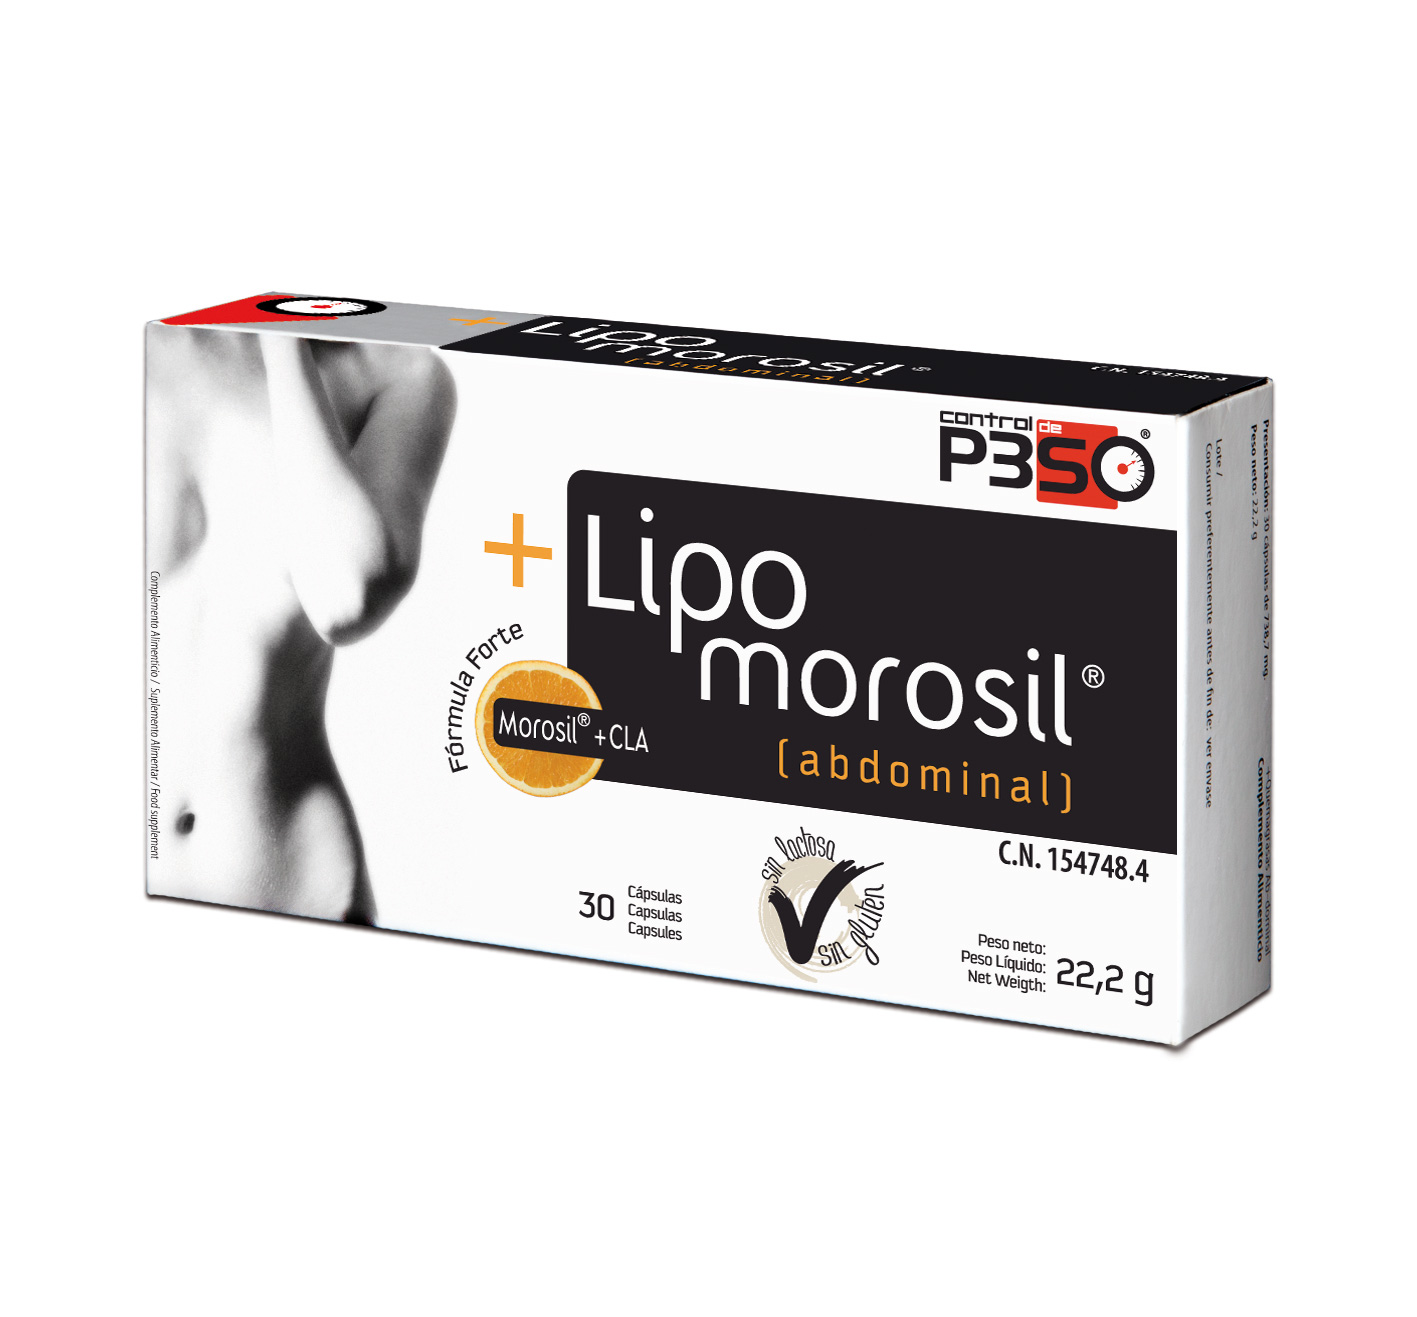 LIPOMOROSIL (QUEMAGRASAS ABDOMINAL) 30 CAPSULAS - Salumet